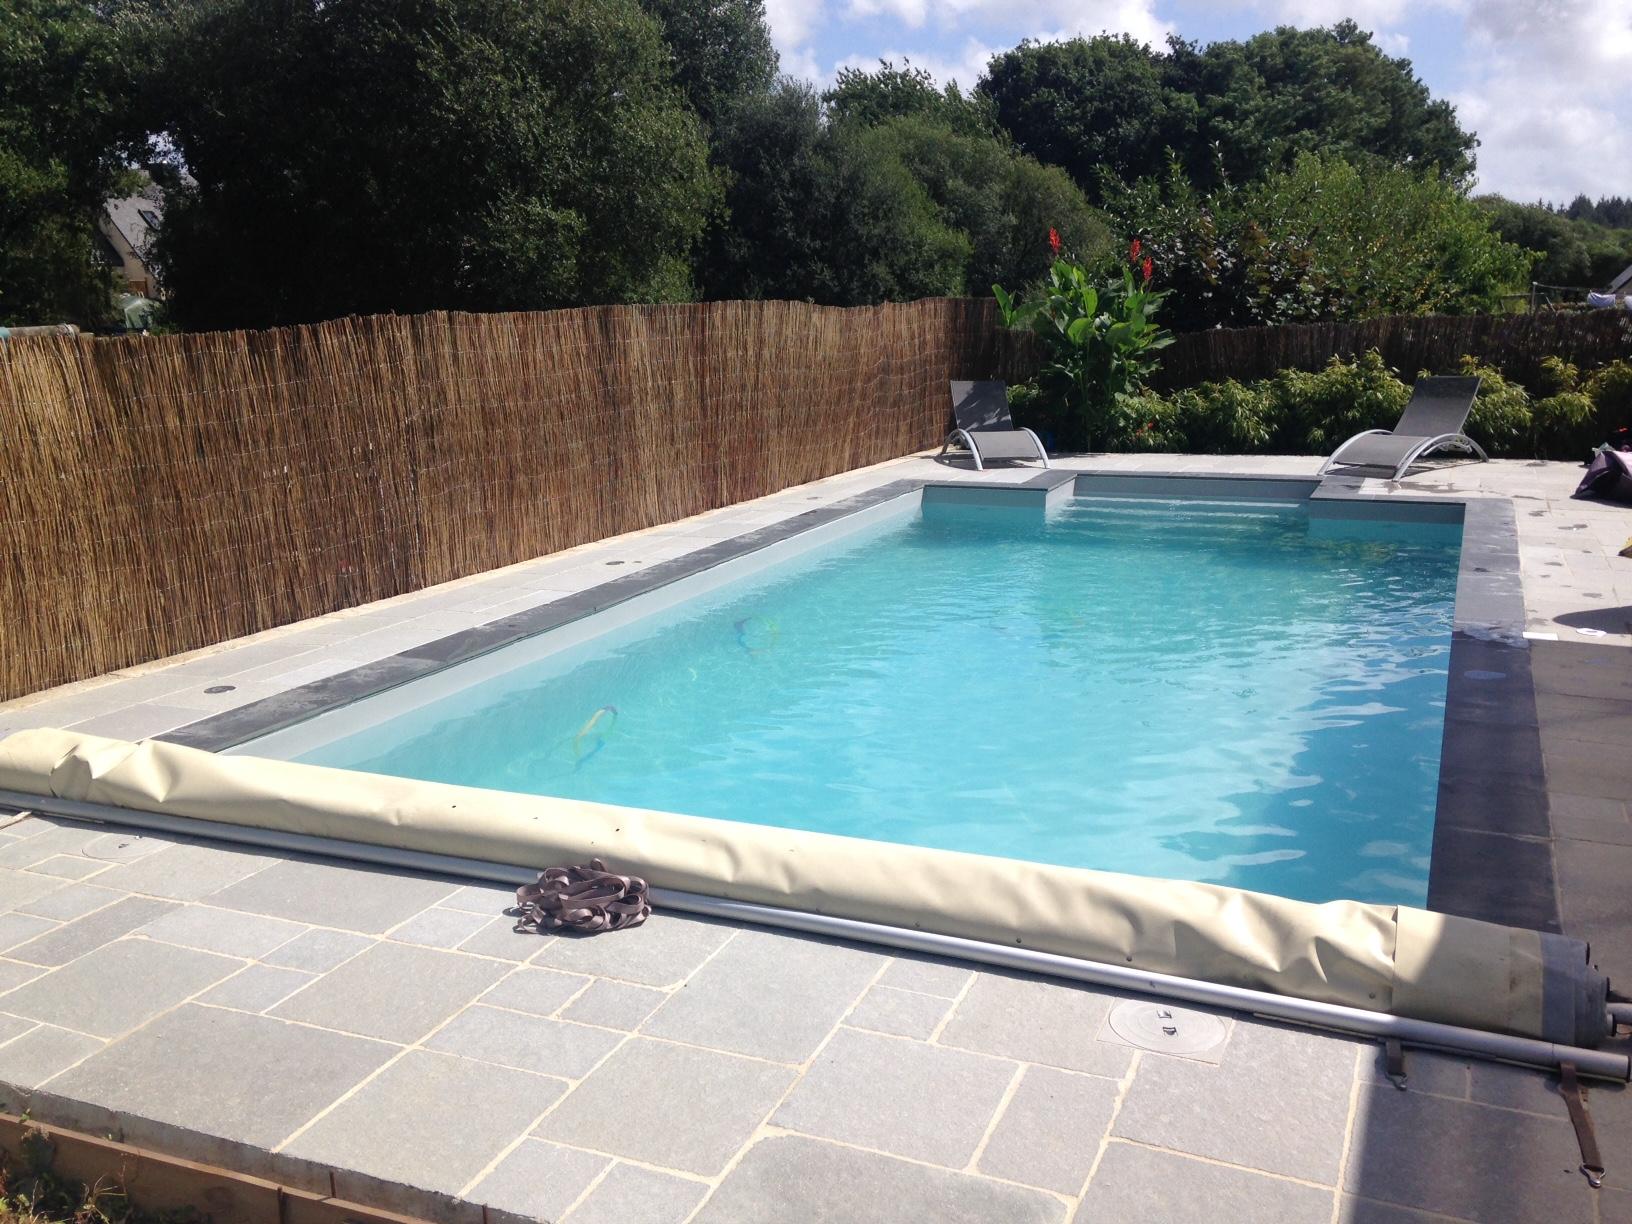 Envie d 39 une piscine cr apaysage - Piscine rectangulaire 4m x 2m ...